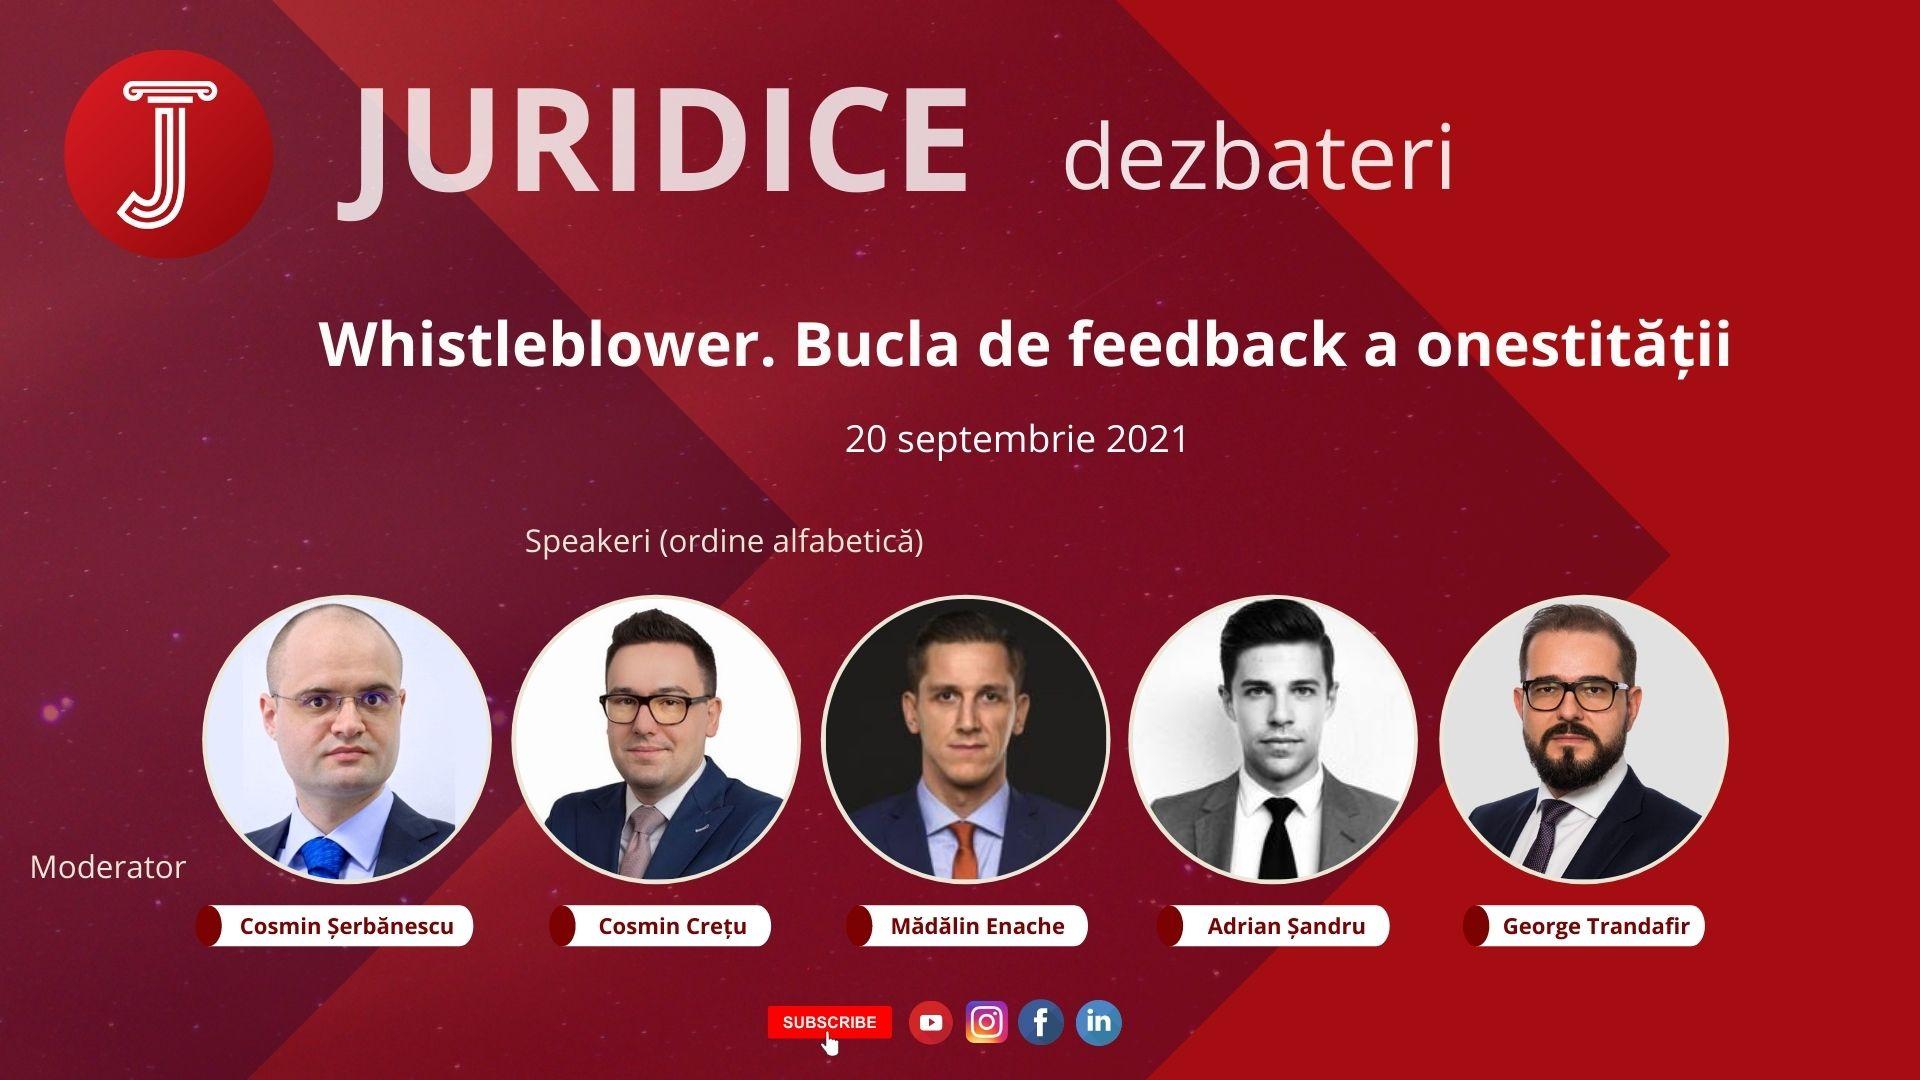 Whistleblower Bucla de feedback a onestității (ediția 481)